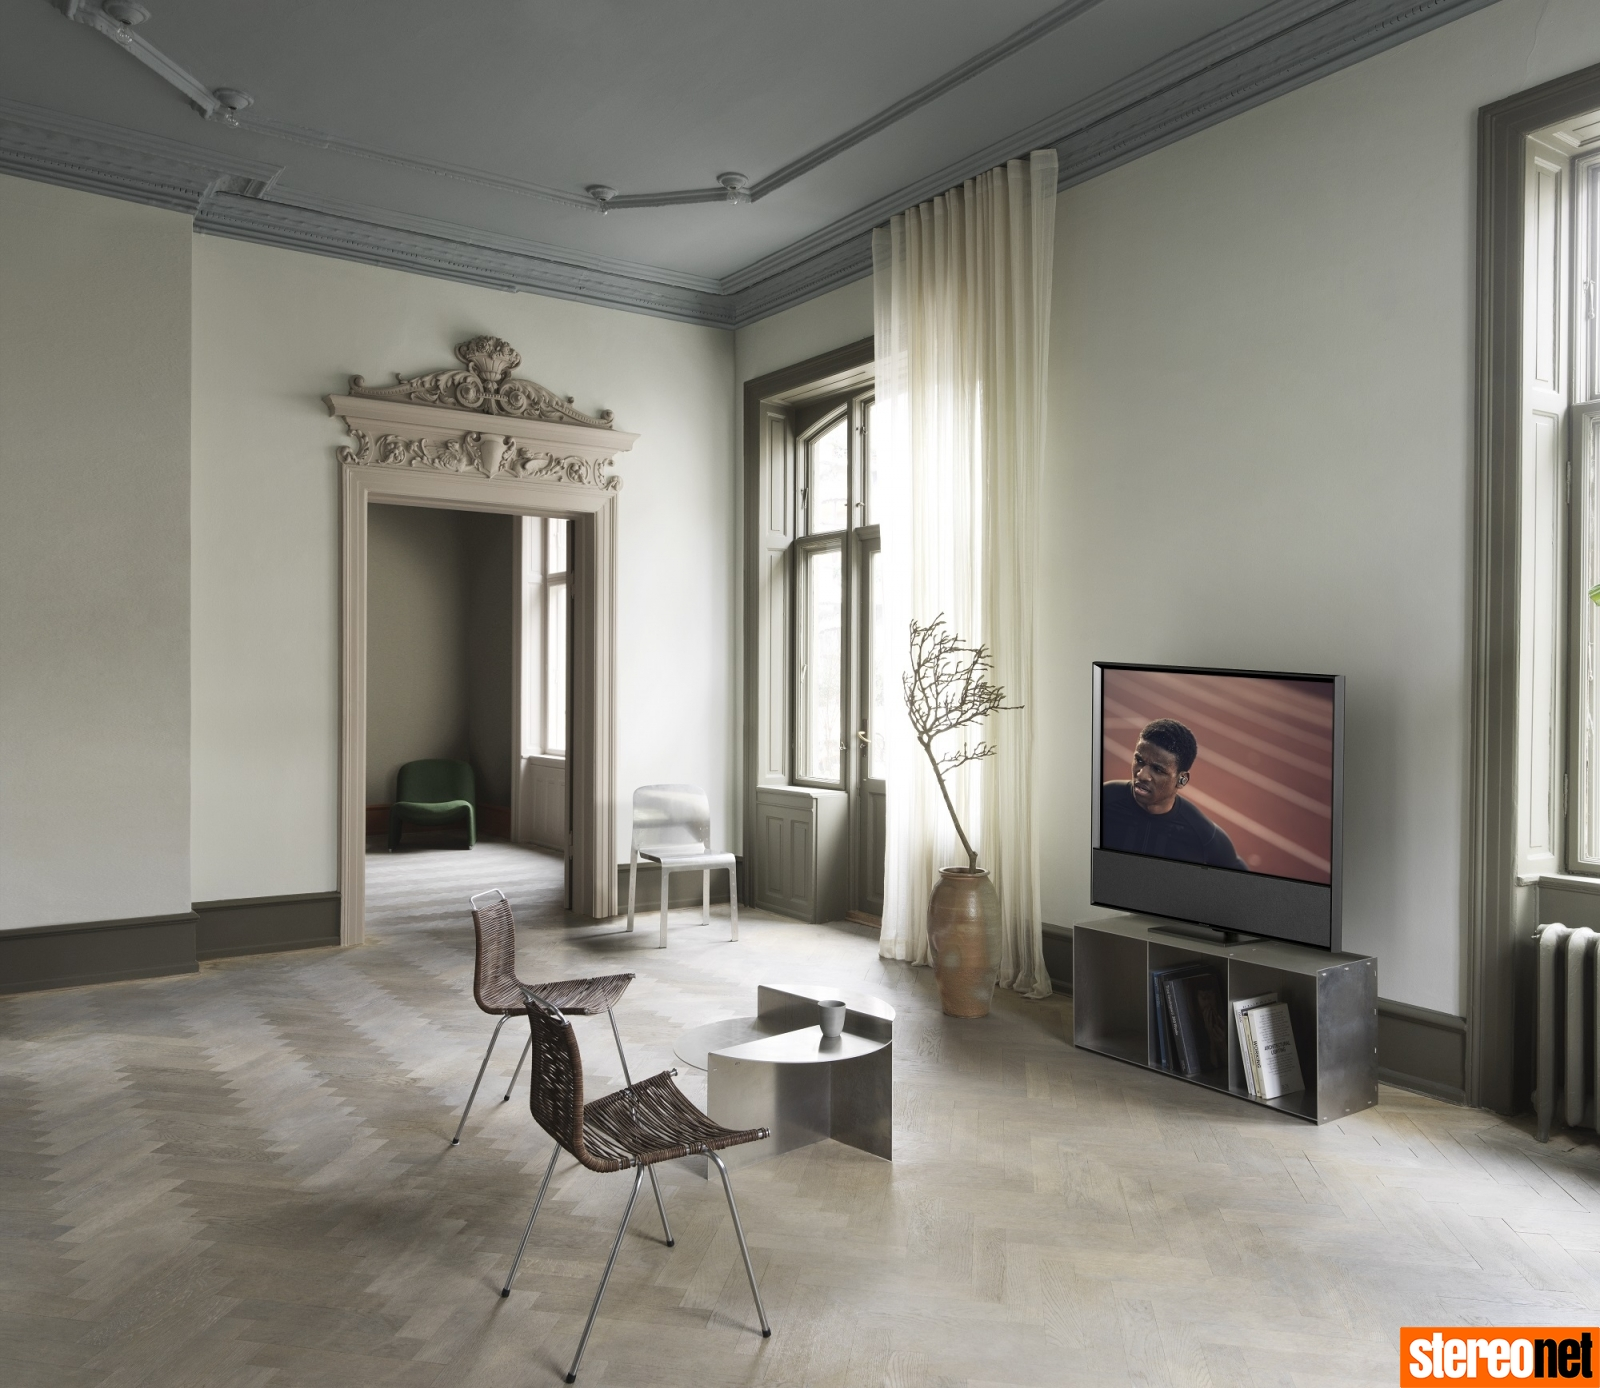 Beovision Contour 55-inch OLED TV